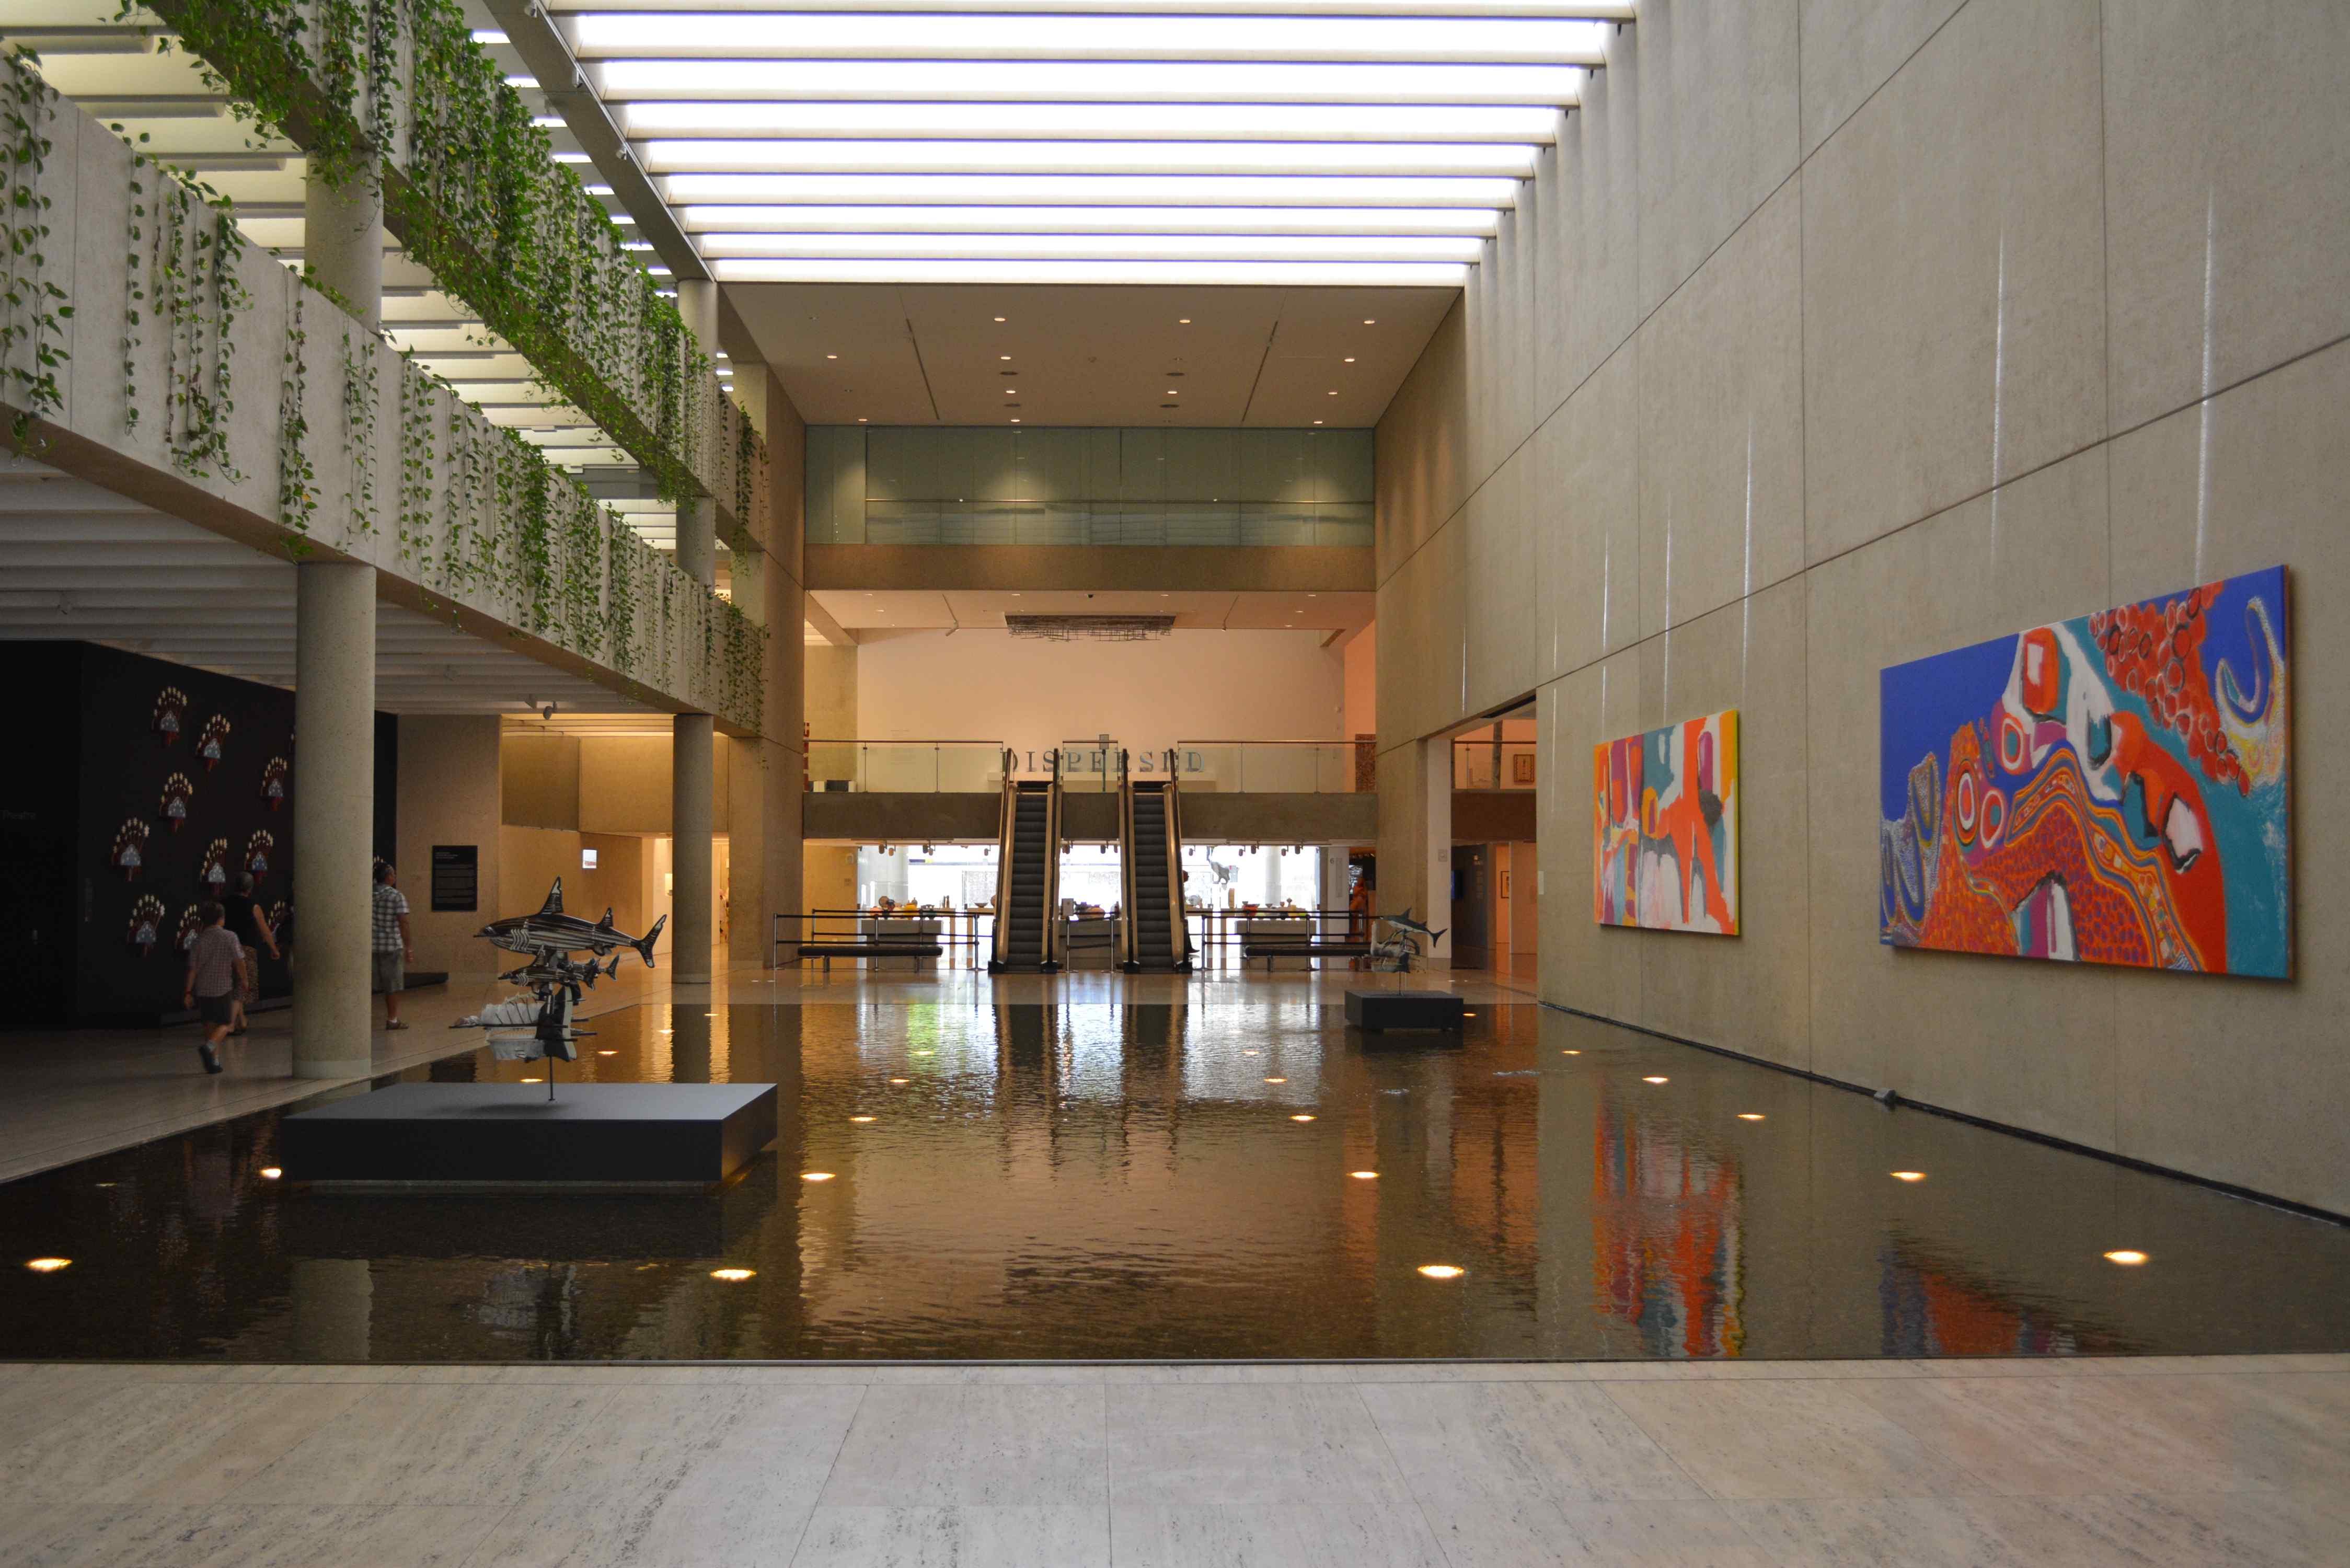 riki wiki queensland art gallery gallery of modern art